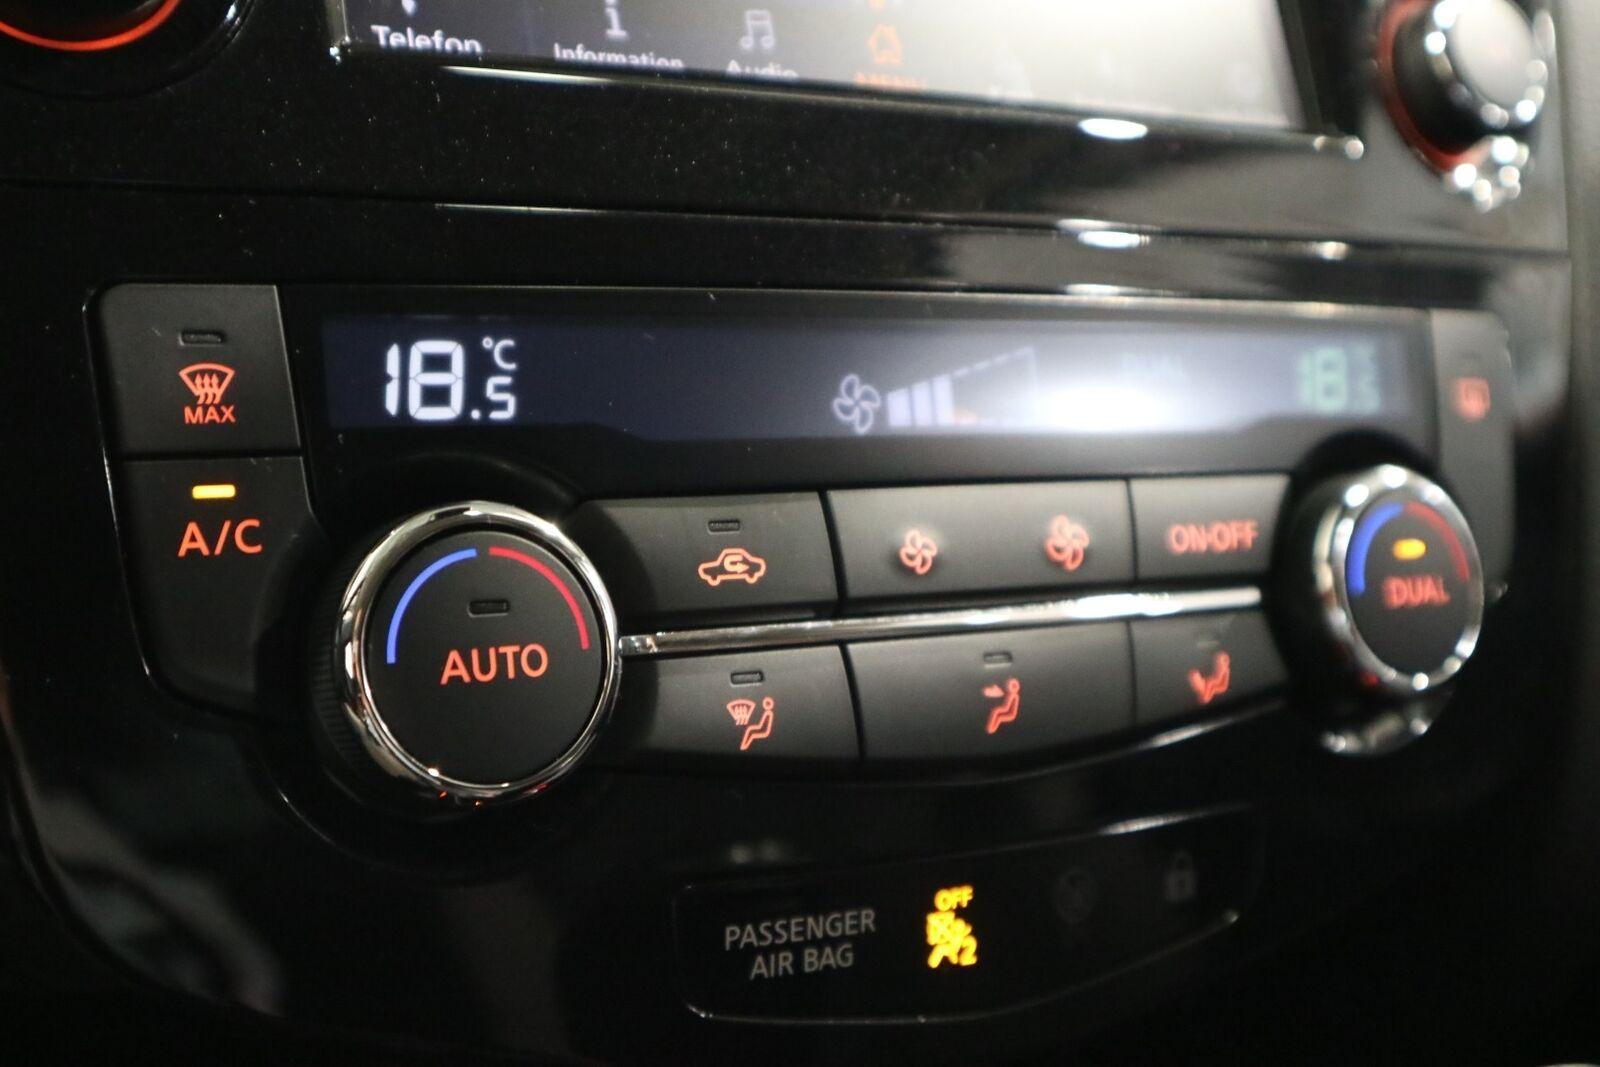 Nissan Qashqai 1,3 Dig-T 160 N-Connecta DCT - billede 6